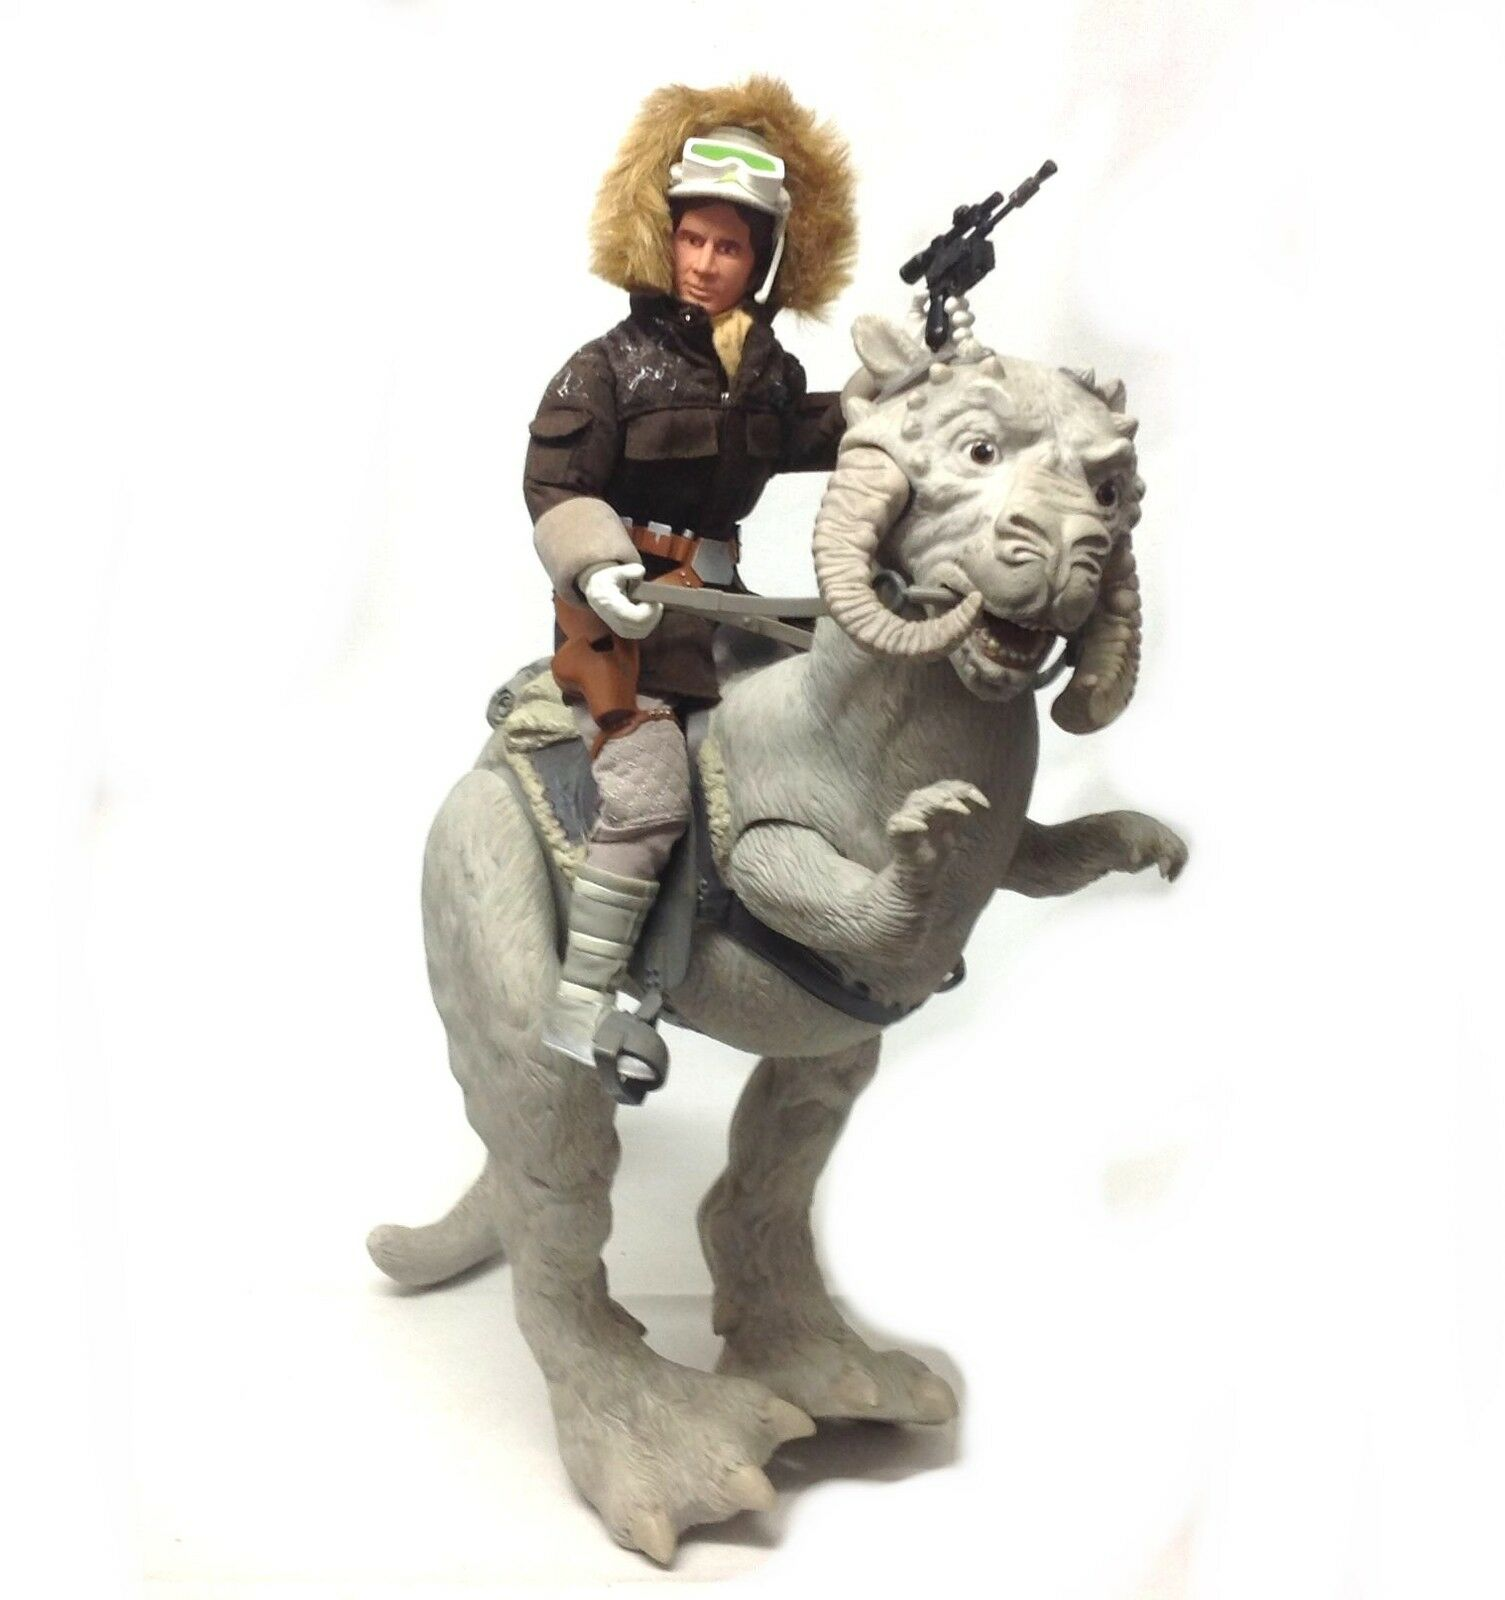 STAR WARS 12  1 6th scale HAN SOLO & TAUN TAUN action figure, RARE ITEM